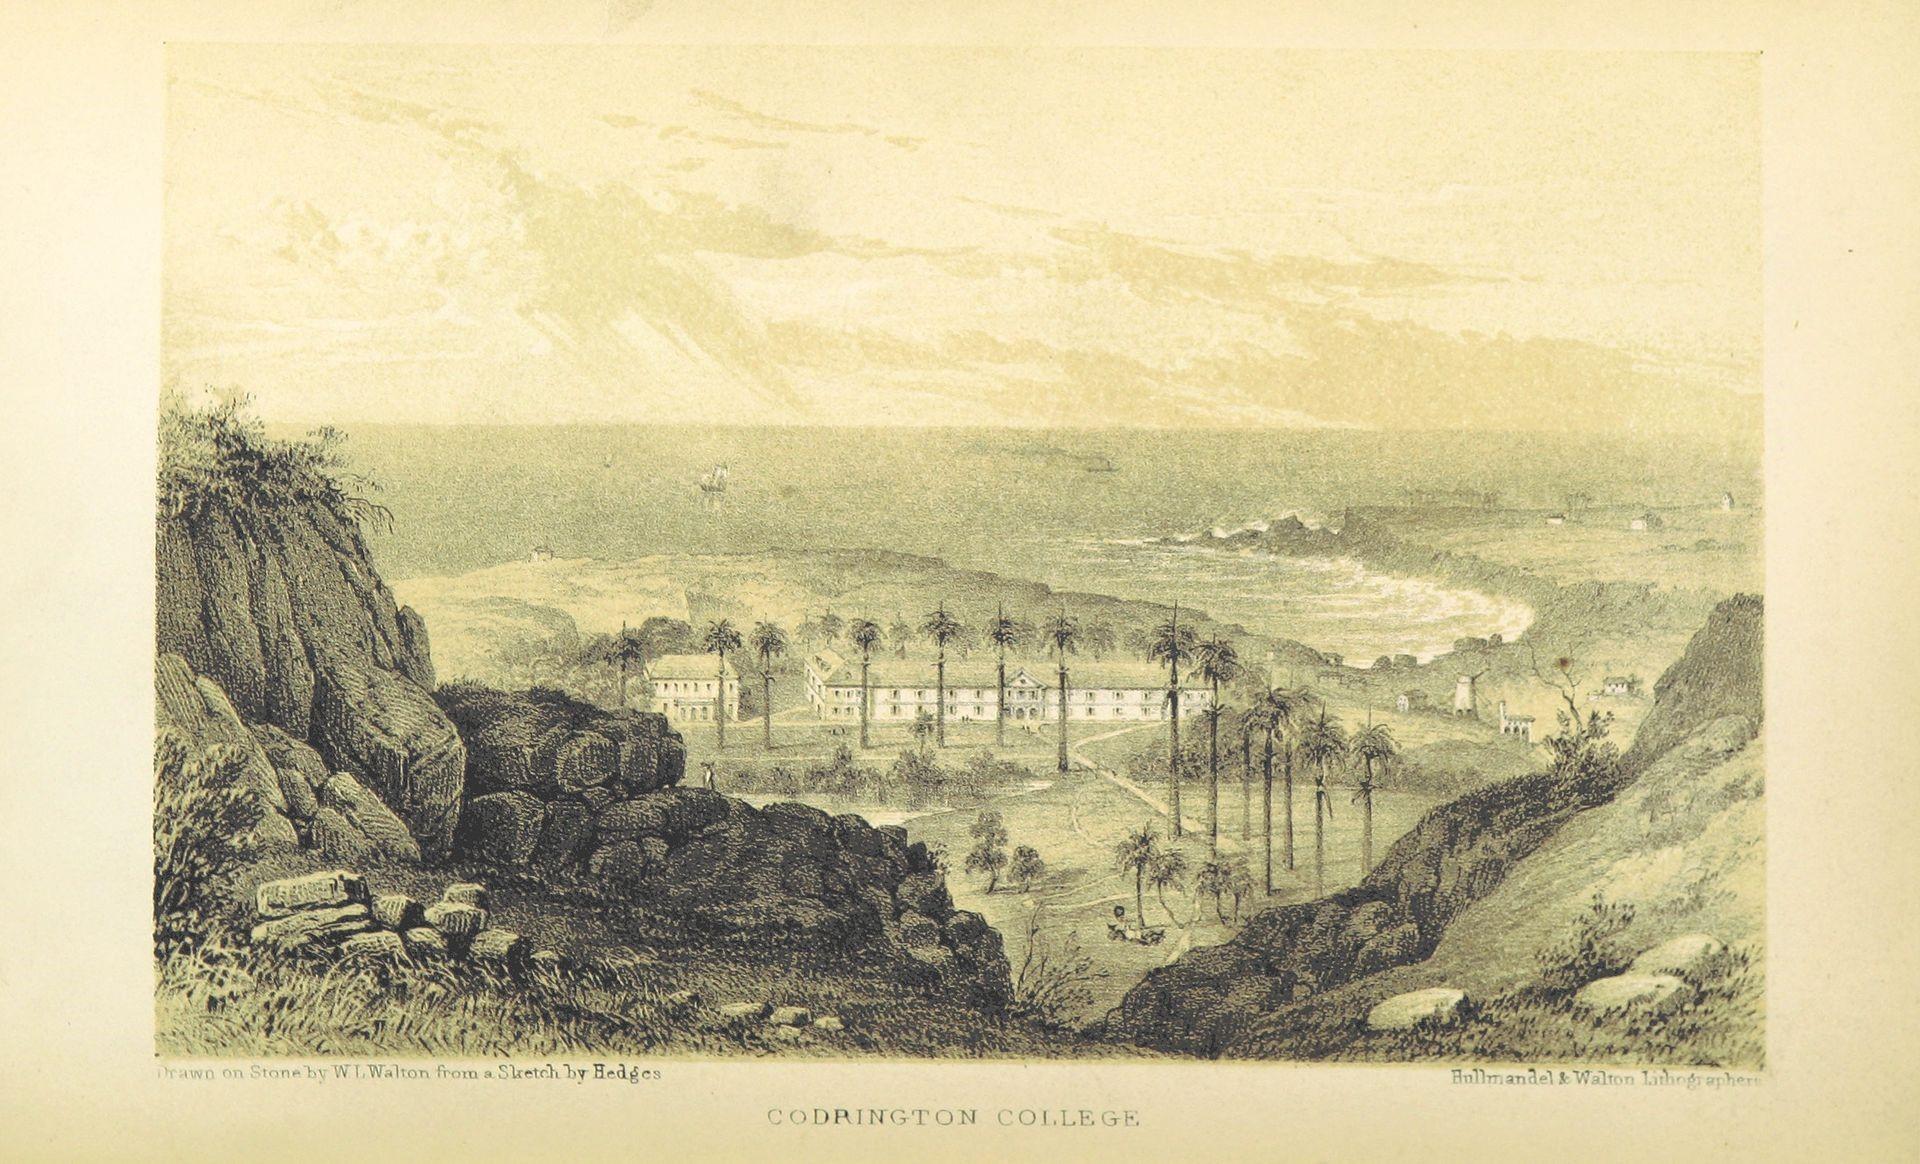 PHOTO CREDIT: Codrington College on Barbados. Illustration drawn from nineteenth century travel books